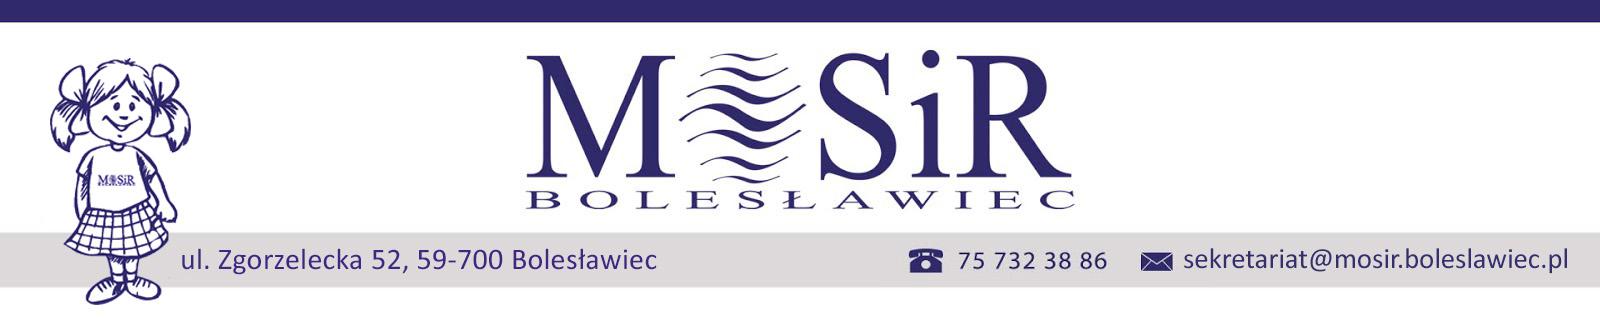 MOSiR Bolesławiec